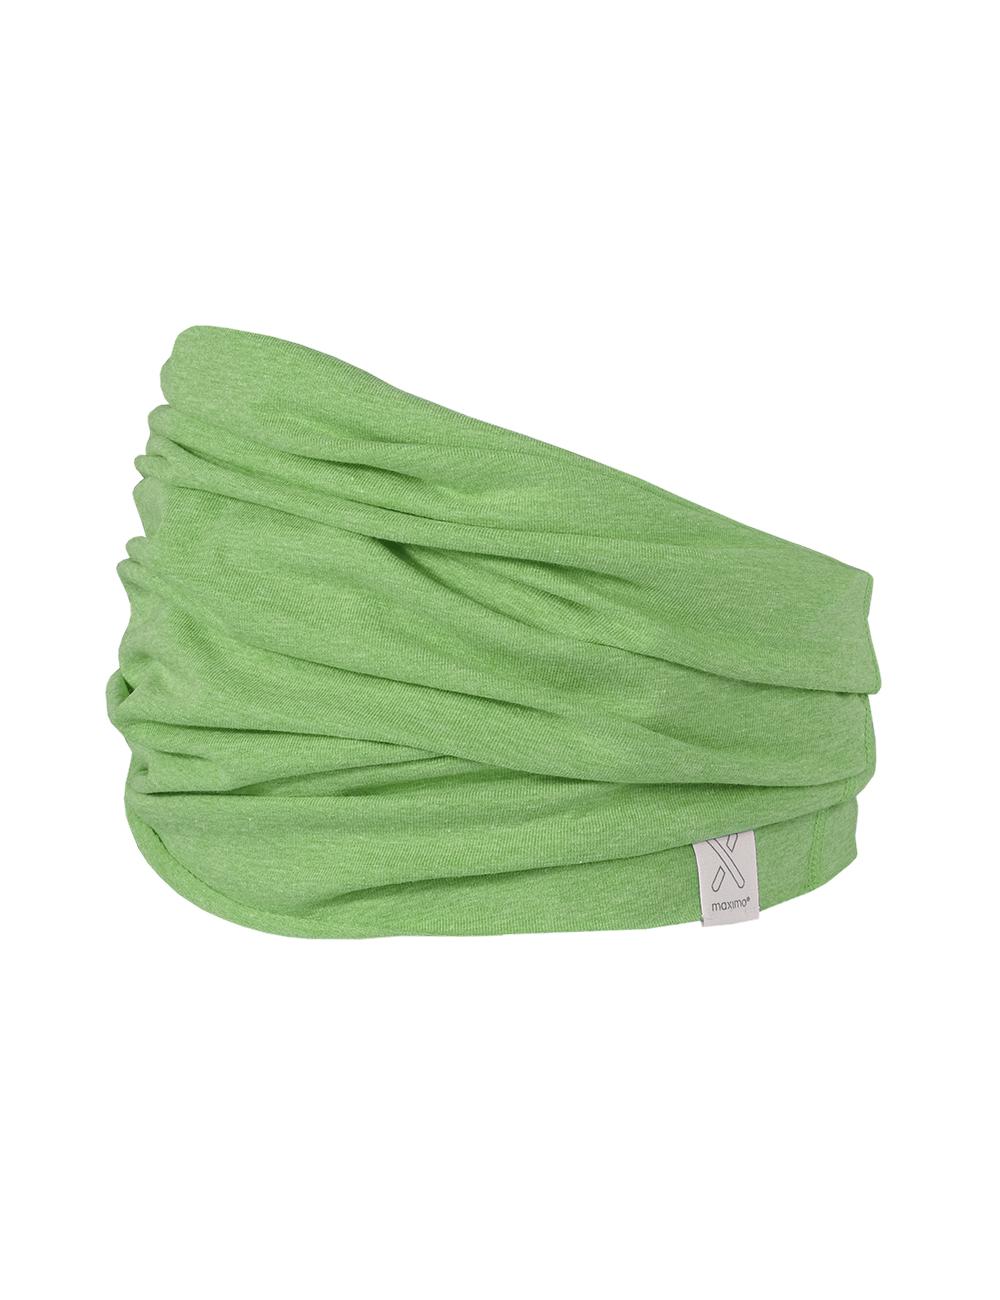 Hals-Nasen-Tuch, Uni 2 Maximo. Farbe: herbalmeliert, Größe: 2